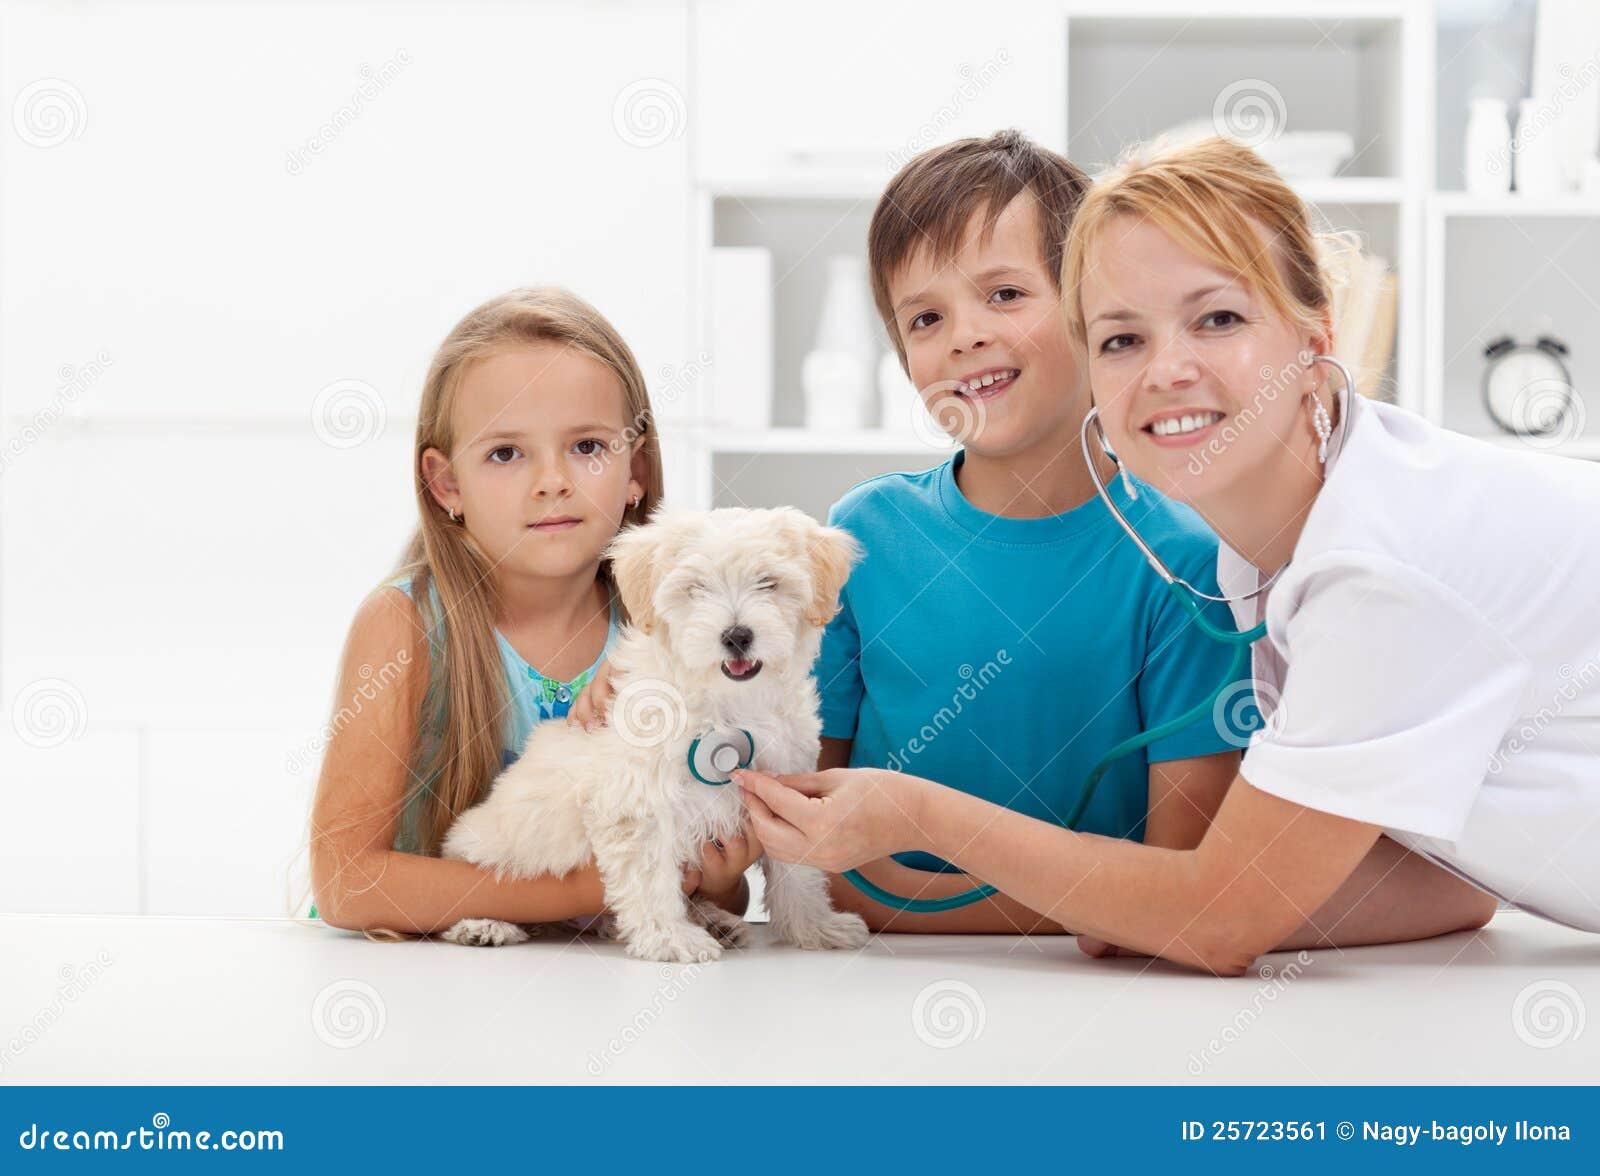 I Love My Dog Video Taking Medicine